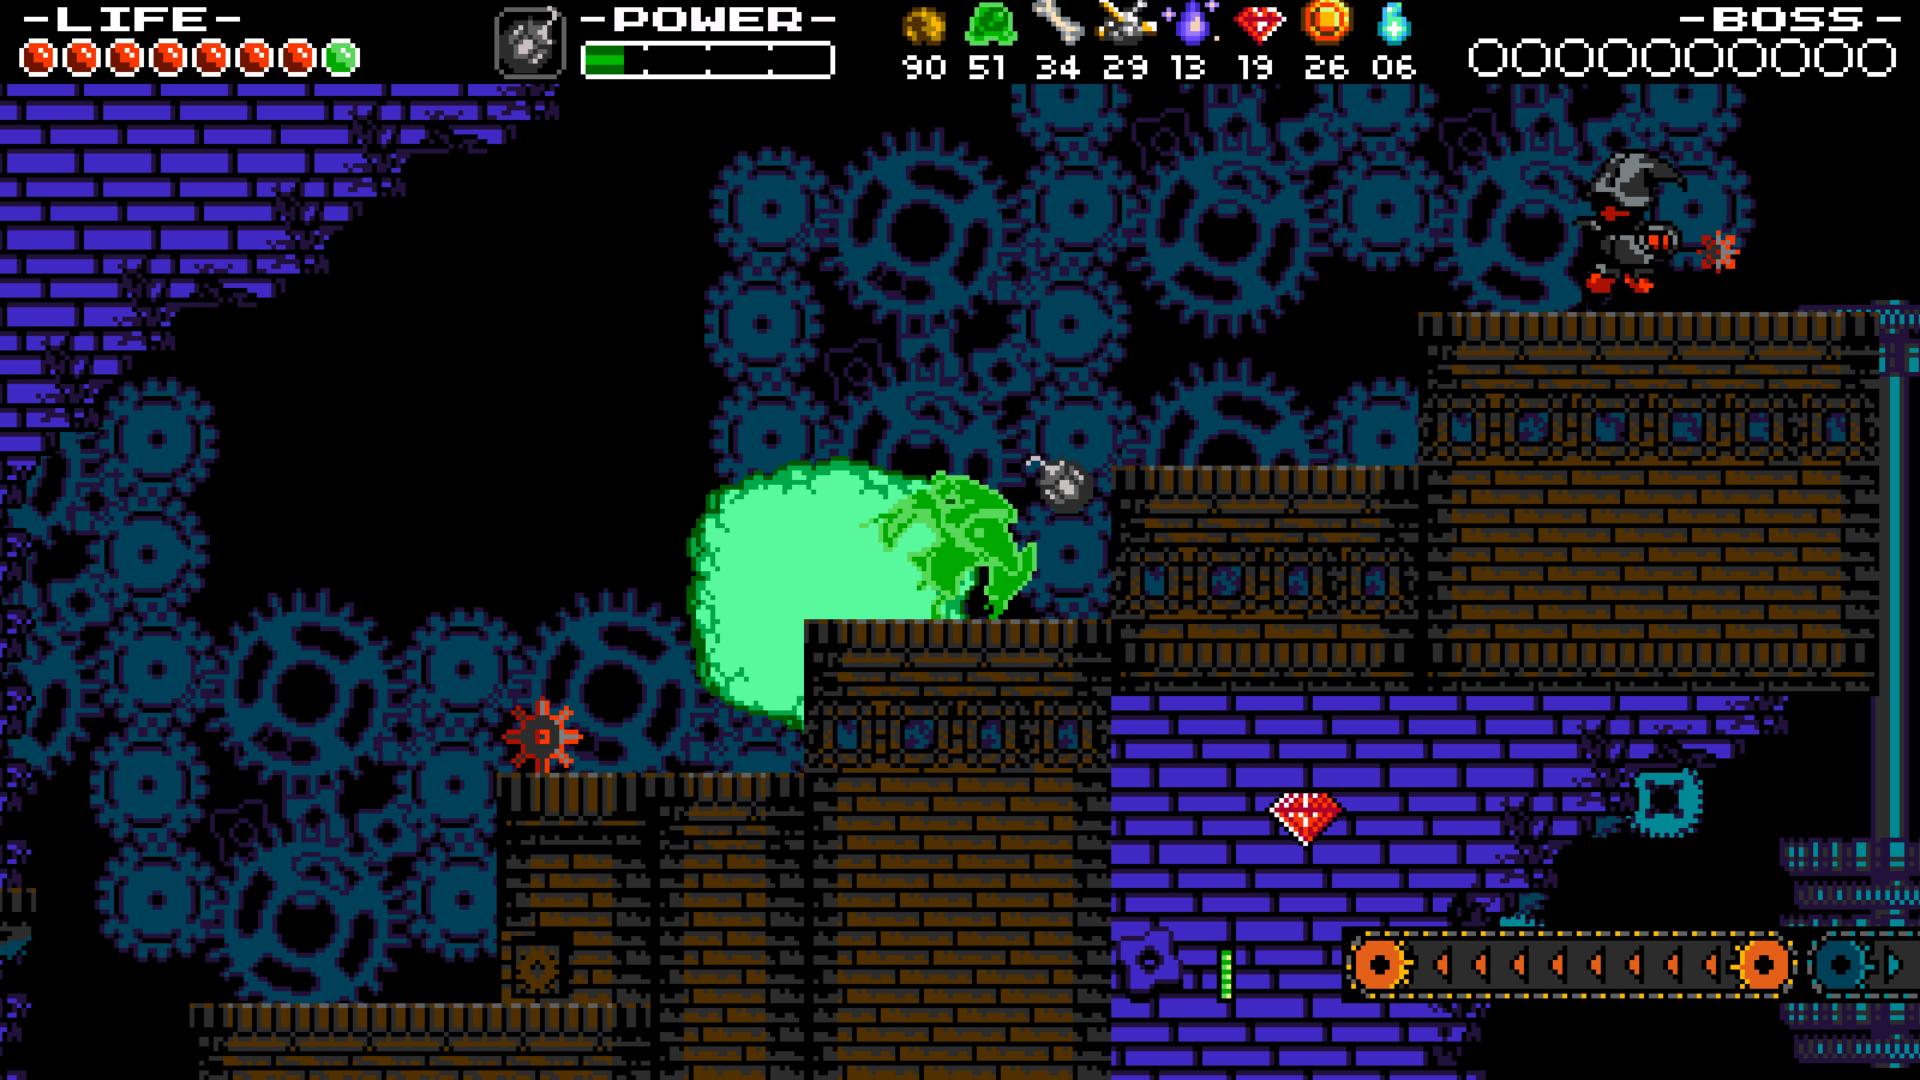 shovel_knight_plague_of_shadows_expanion_screenshot1